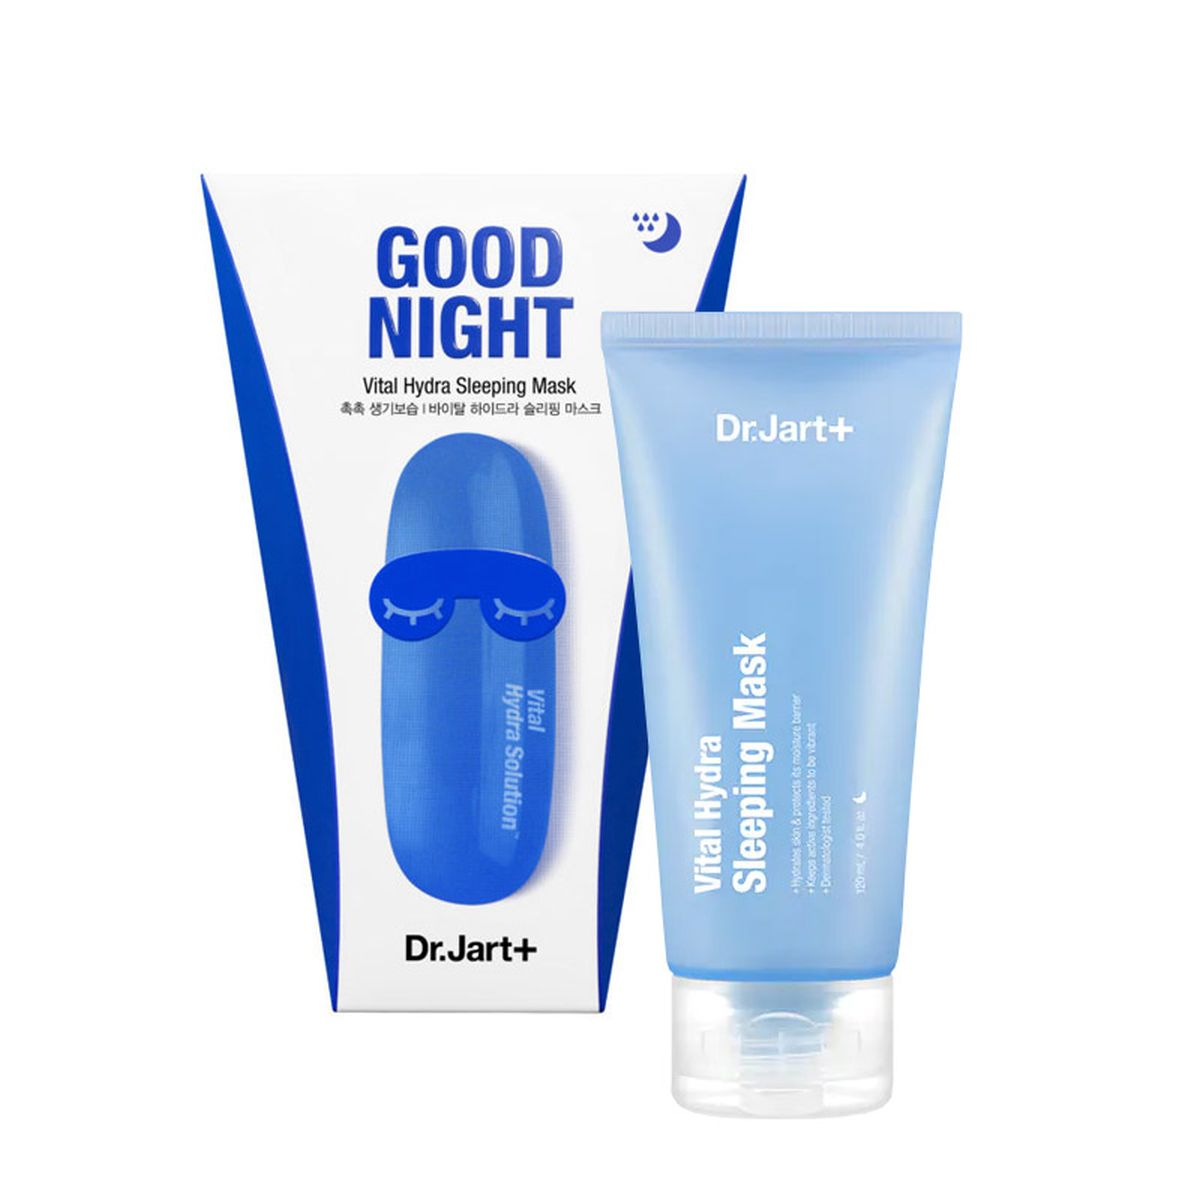 Увлажняющая ночная маска Dr.Jart+ Good Night Vital Hydra Sleeping Mask - 120 мл